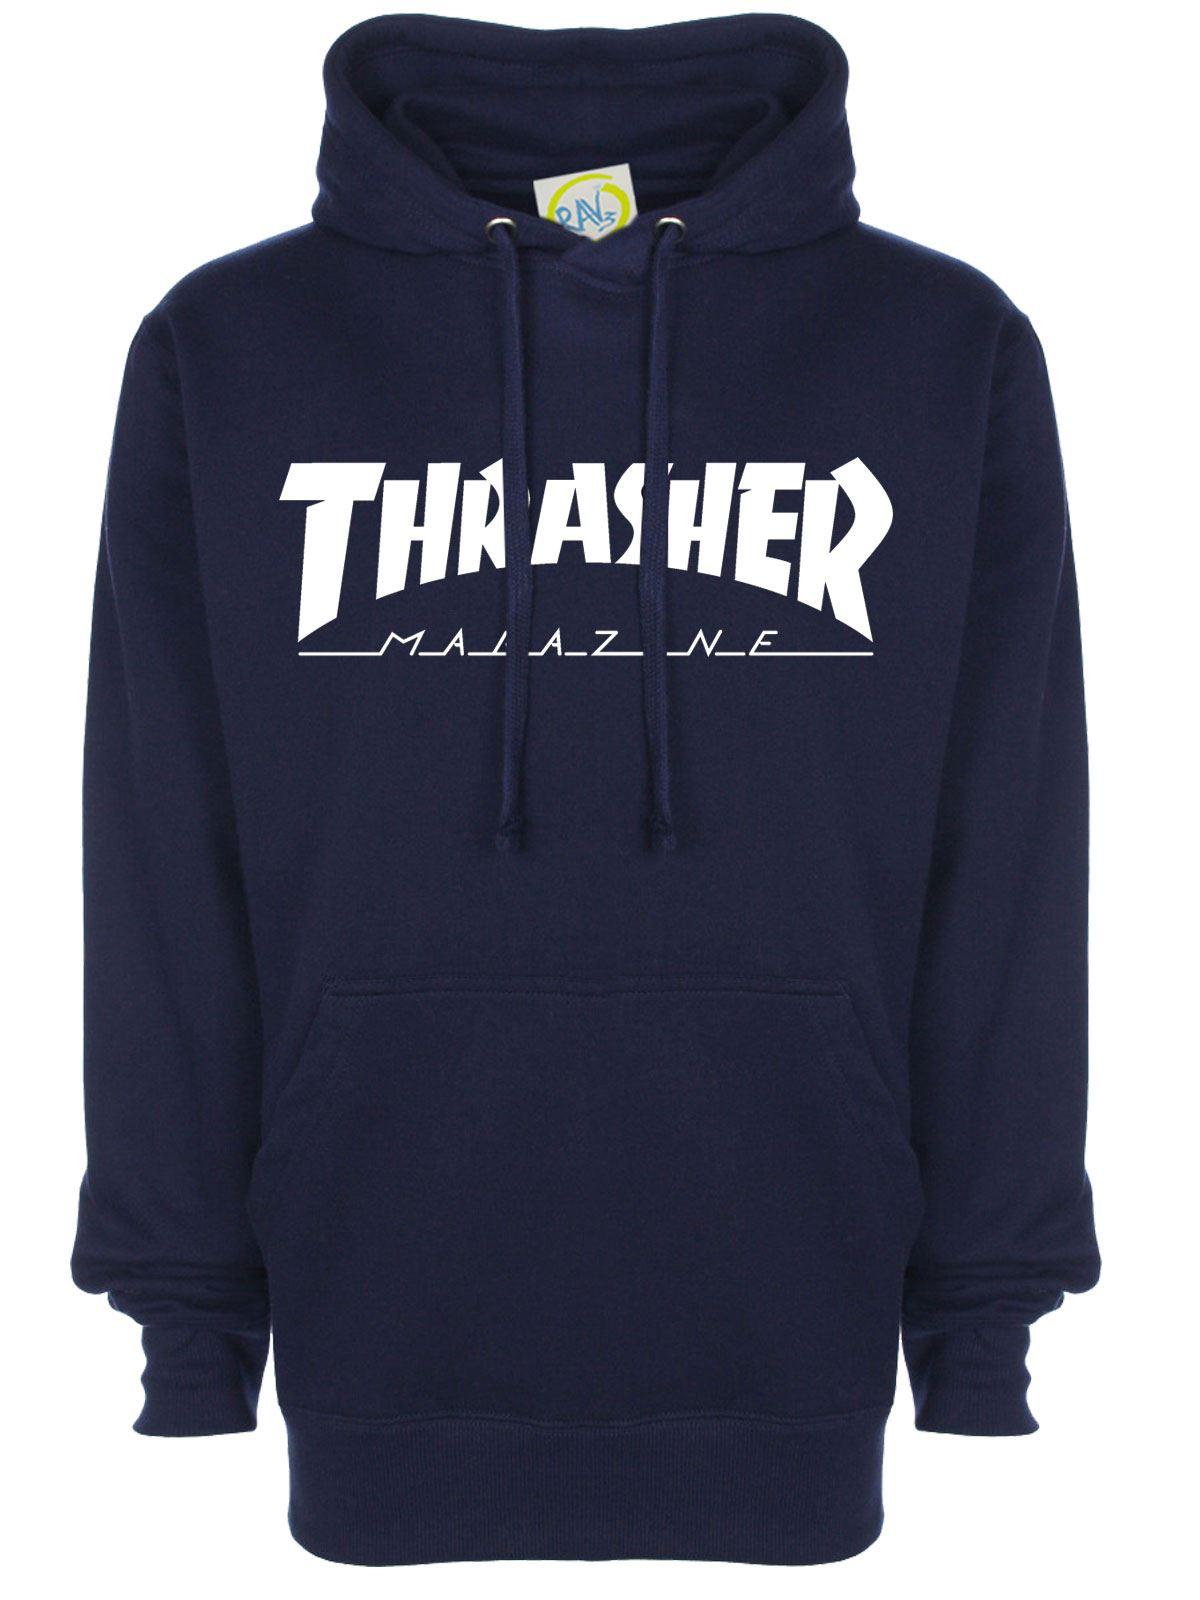 c4a7fd66c0ff 2018 Men Women Kids Hip-hop Hoodie Basic Skateboard Thrasher Sweatshirts  Sweater